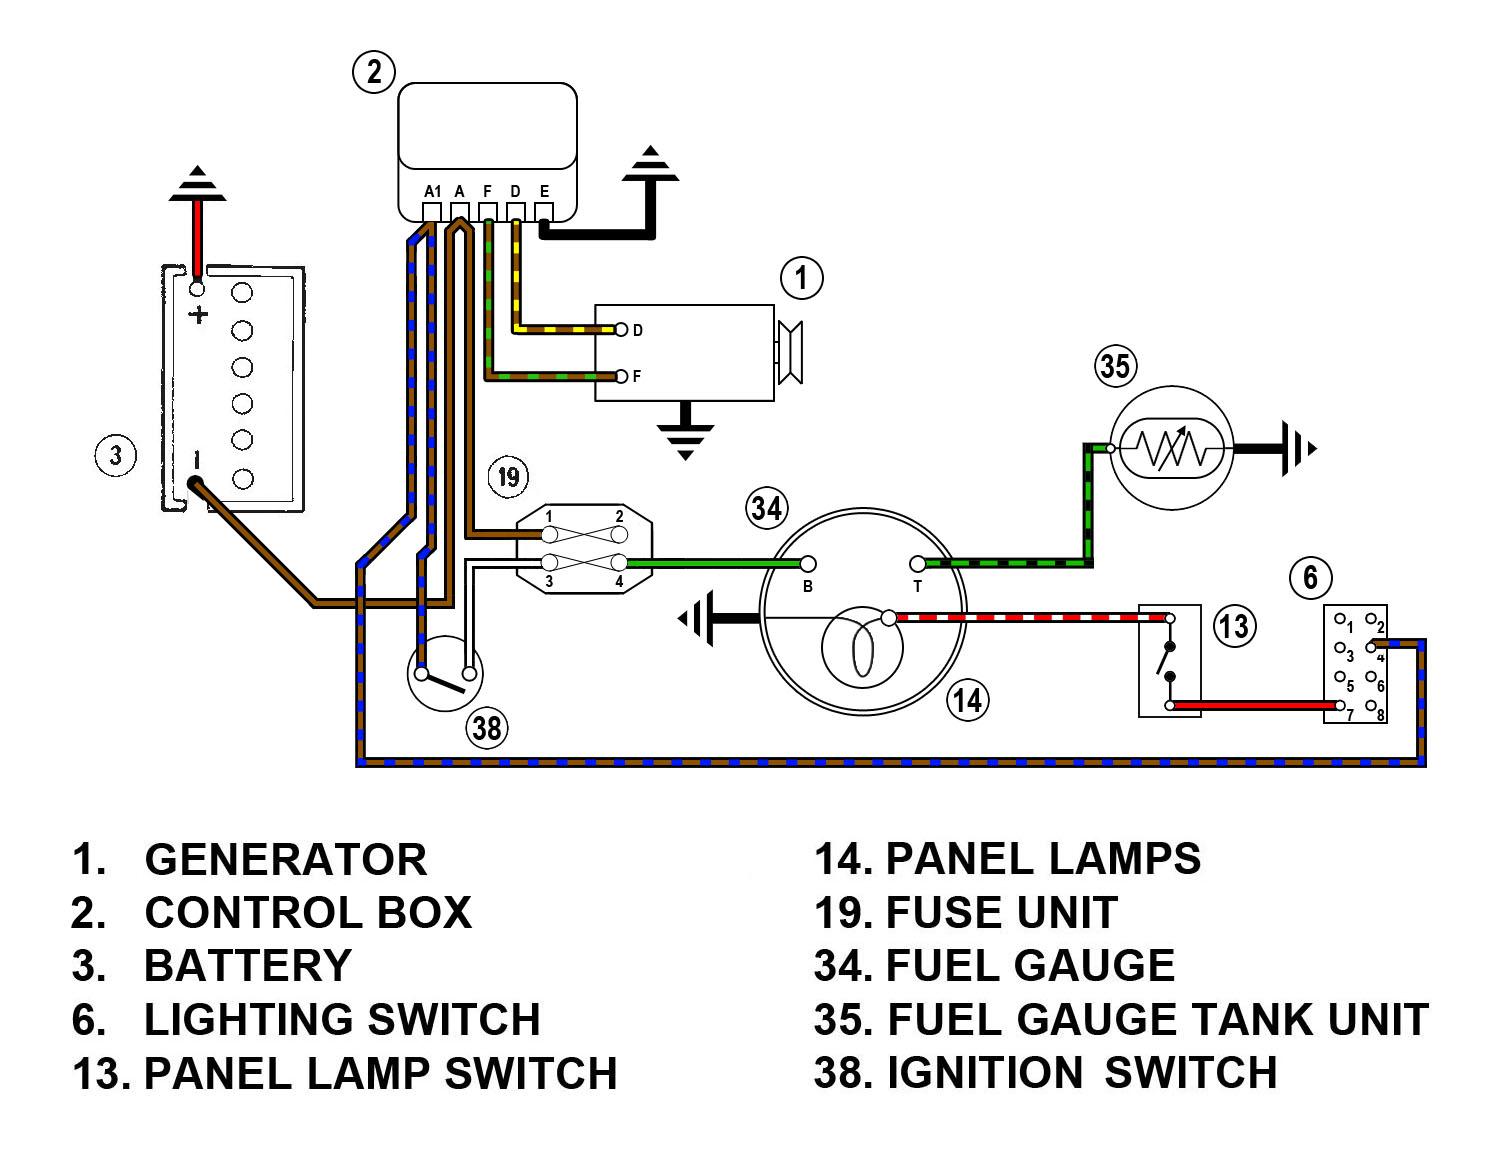 FuelGaugeWiringSpMkII_MGMkI genie 51689gt wiring harness diagram wiring diagrams for diy car  at bakdesigns.co